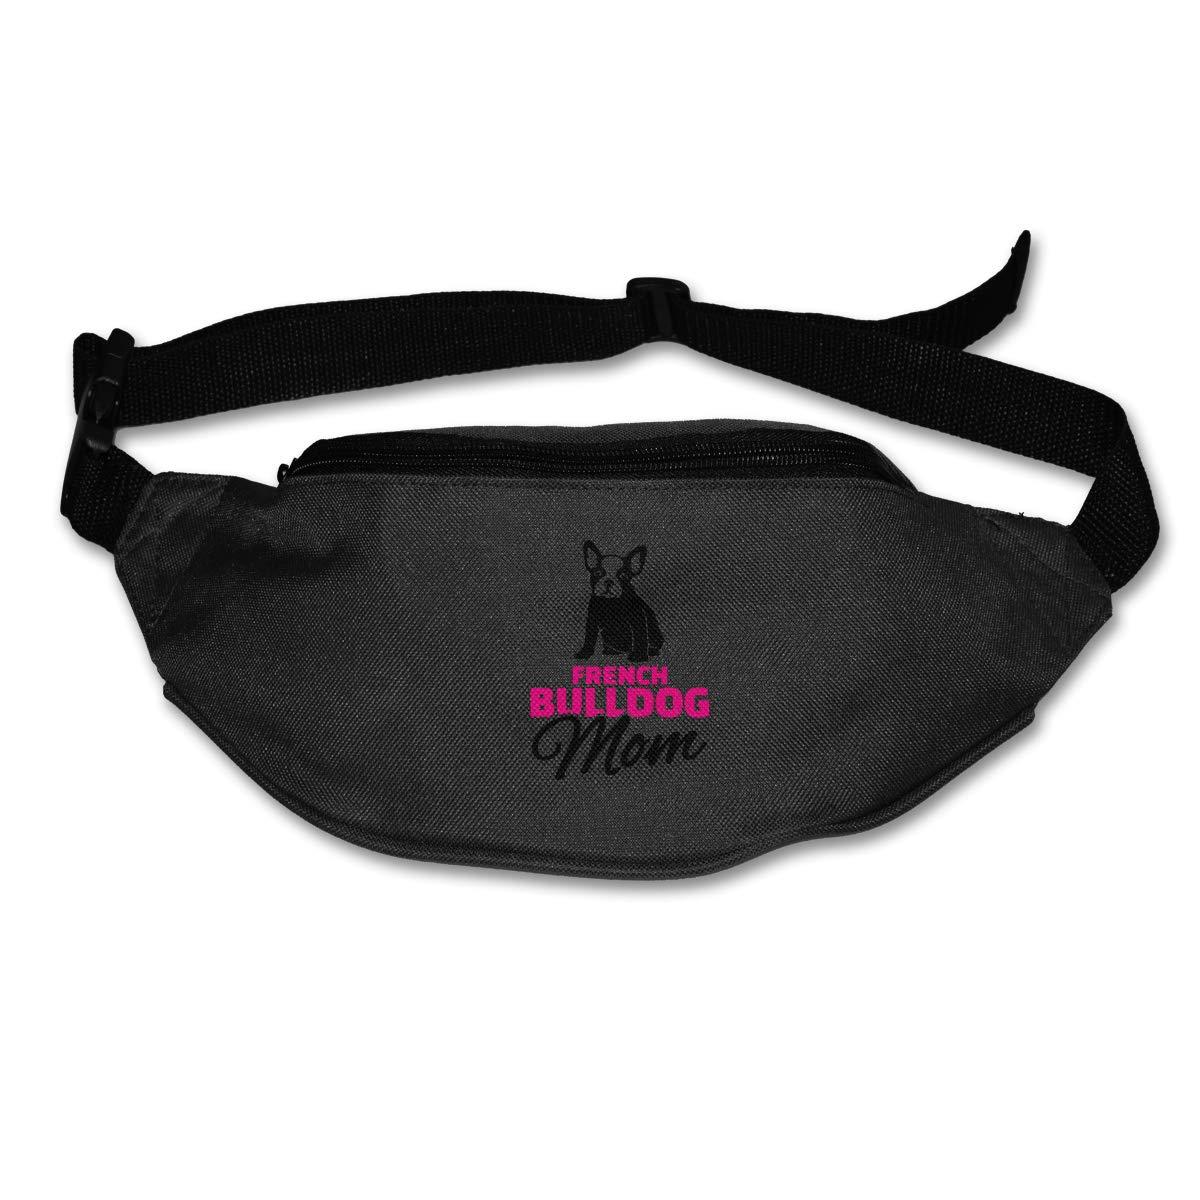 French Bulldog Mom Sport Waist Packs Fanny Pack Adjustable For Run